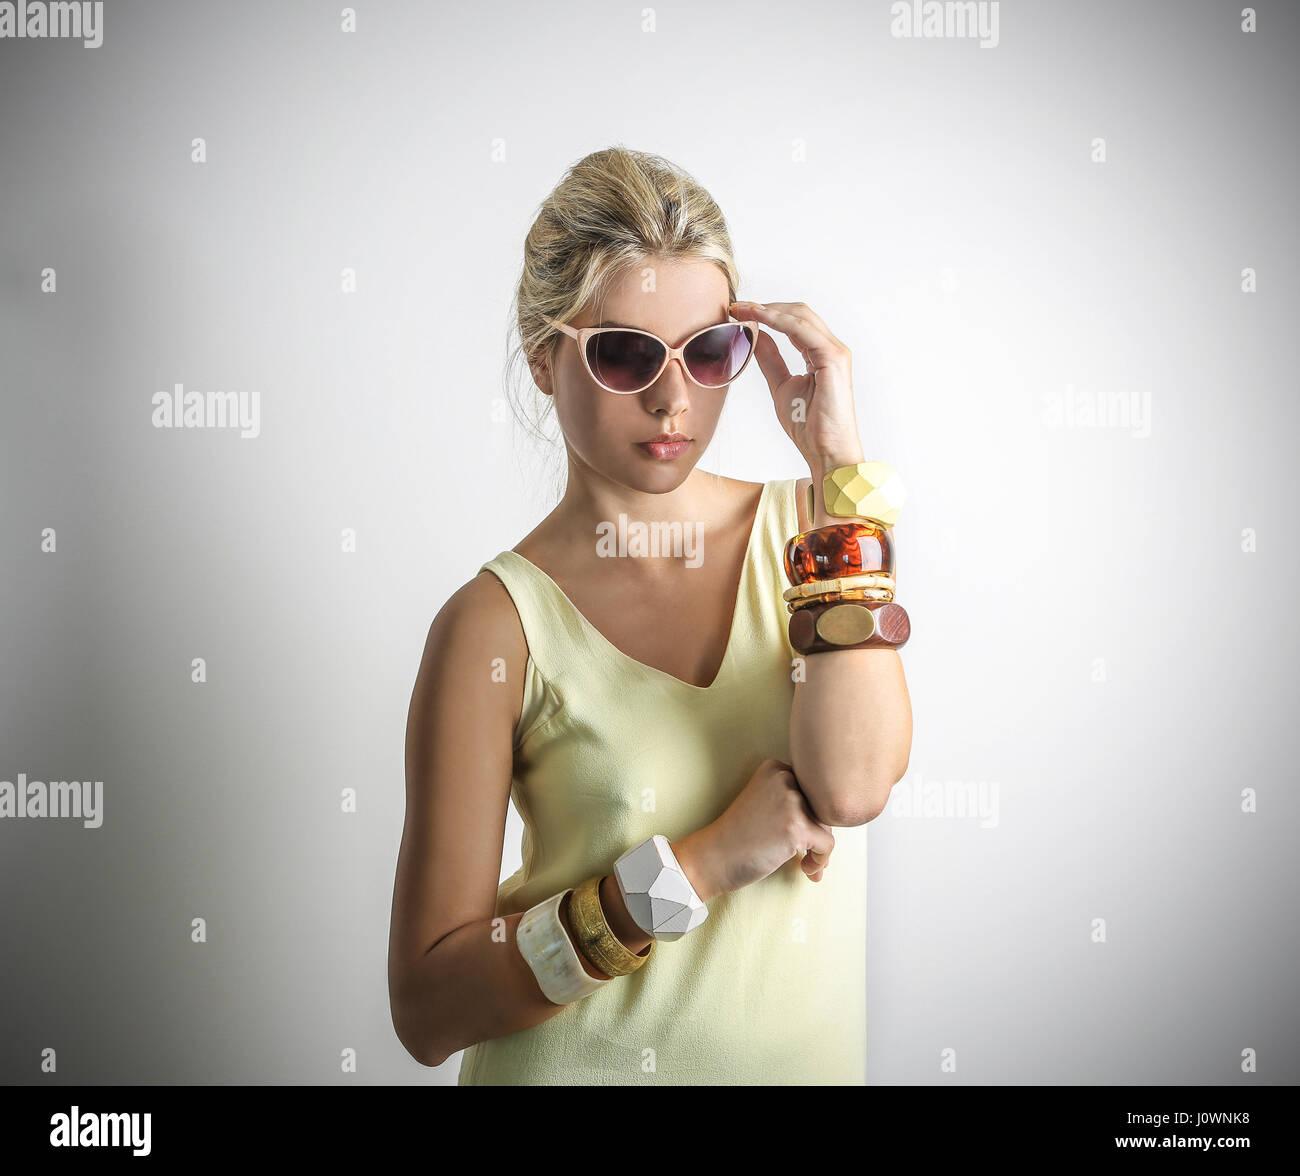 Blond woman with bracelets - Stock Image